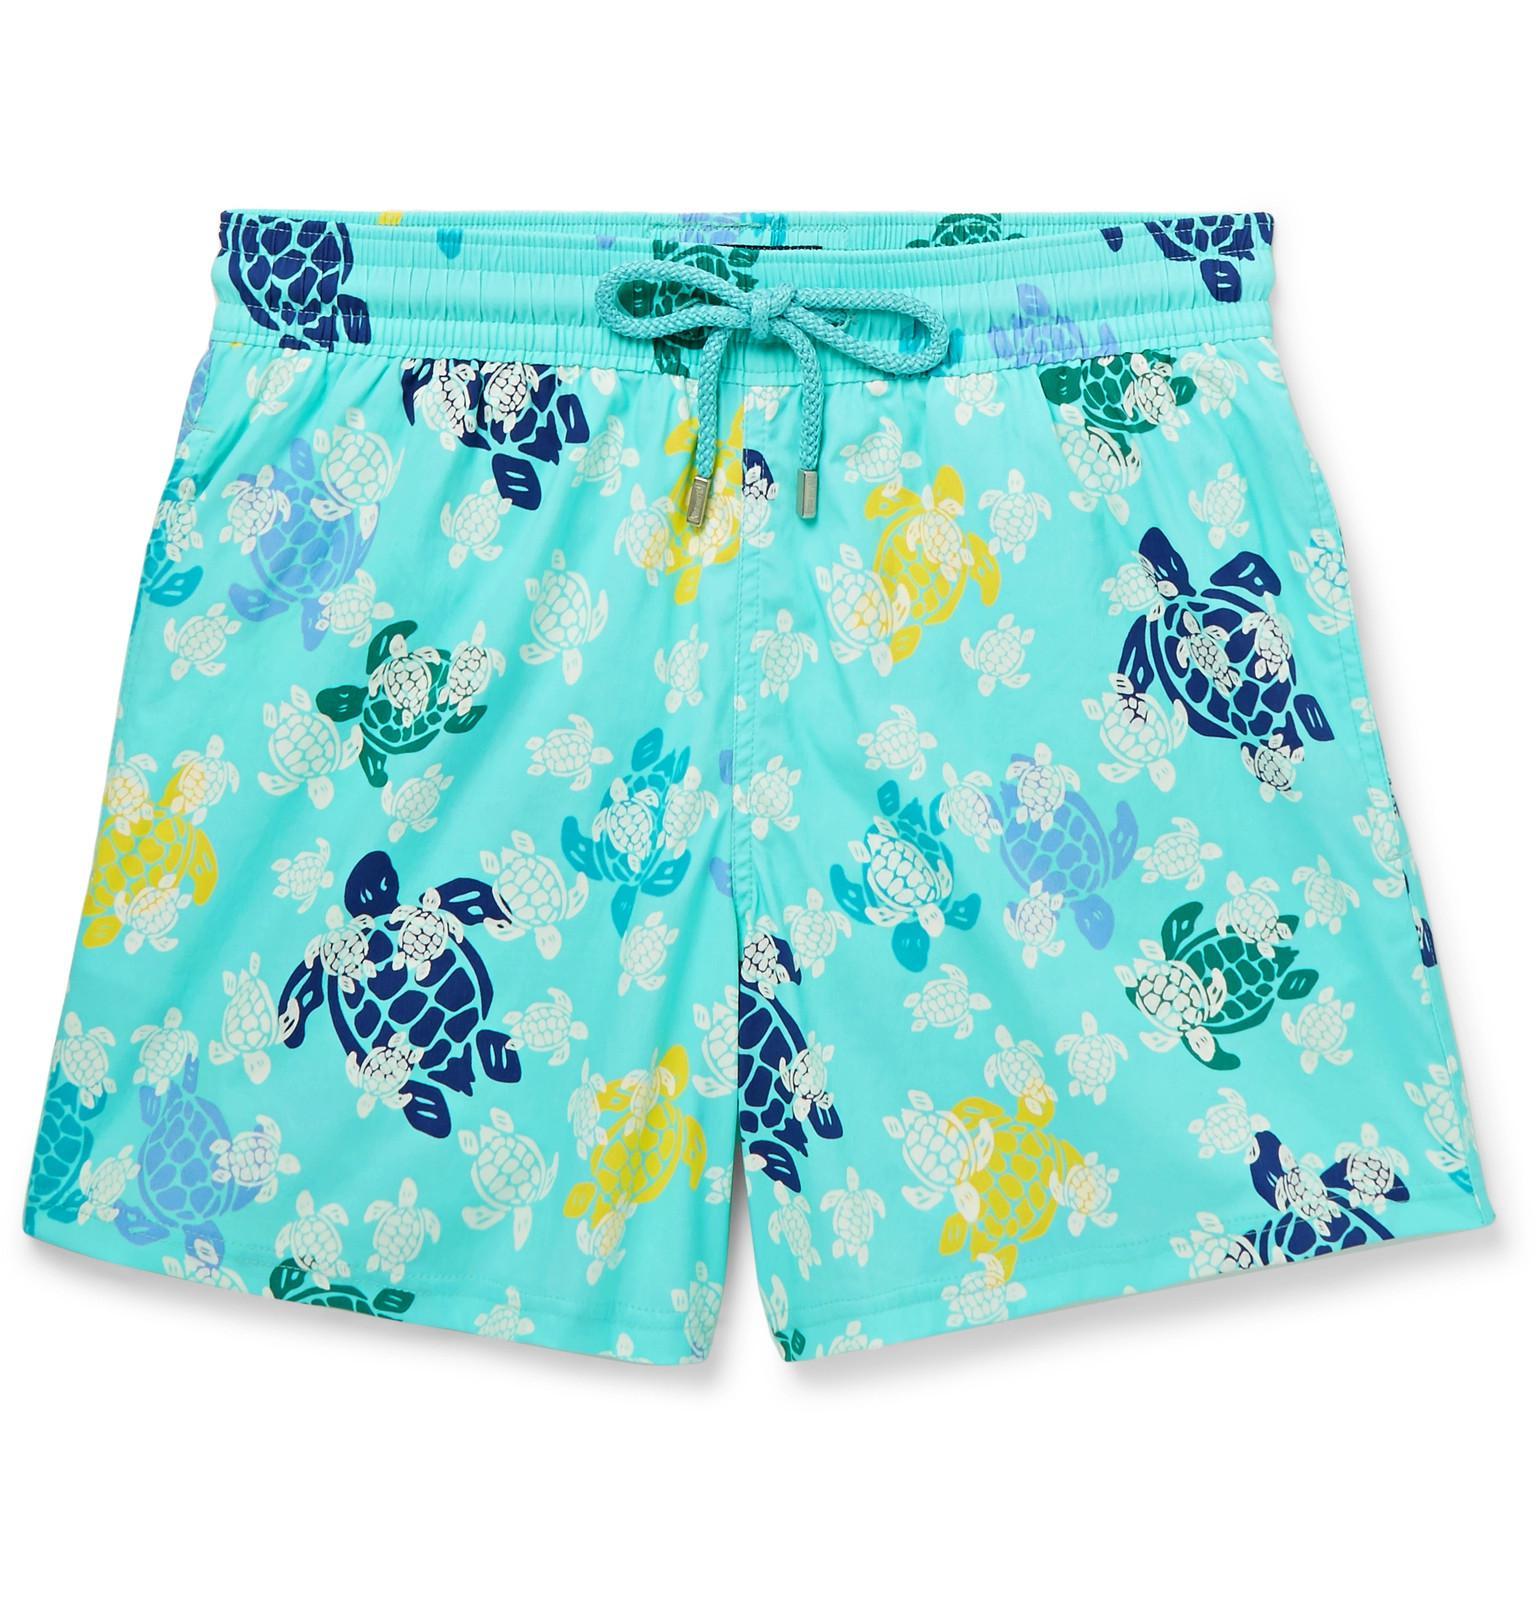 6efb69bb91faa Vilebrequin Moorise Mid-length Glow-in-the-dark Printed Swim Shorts ...